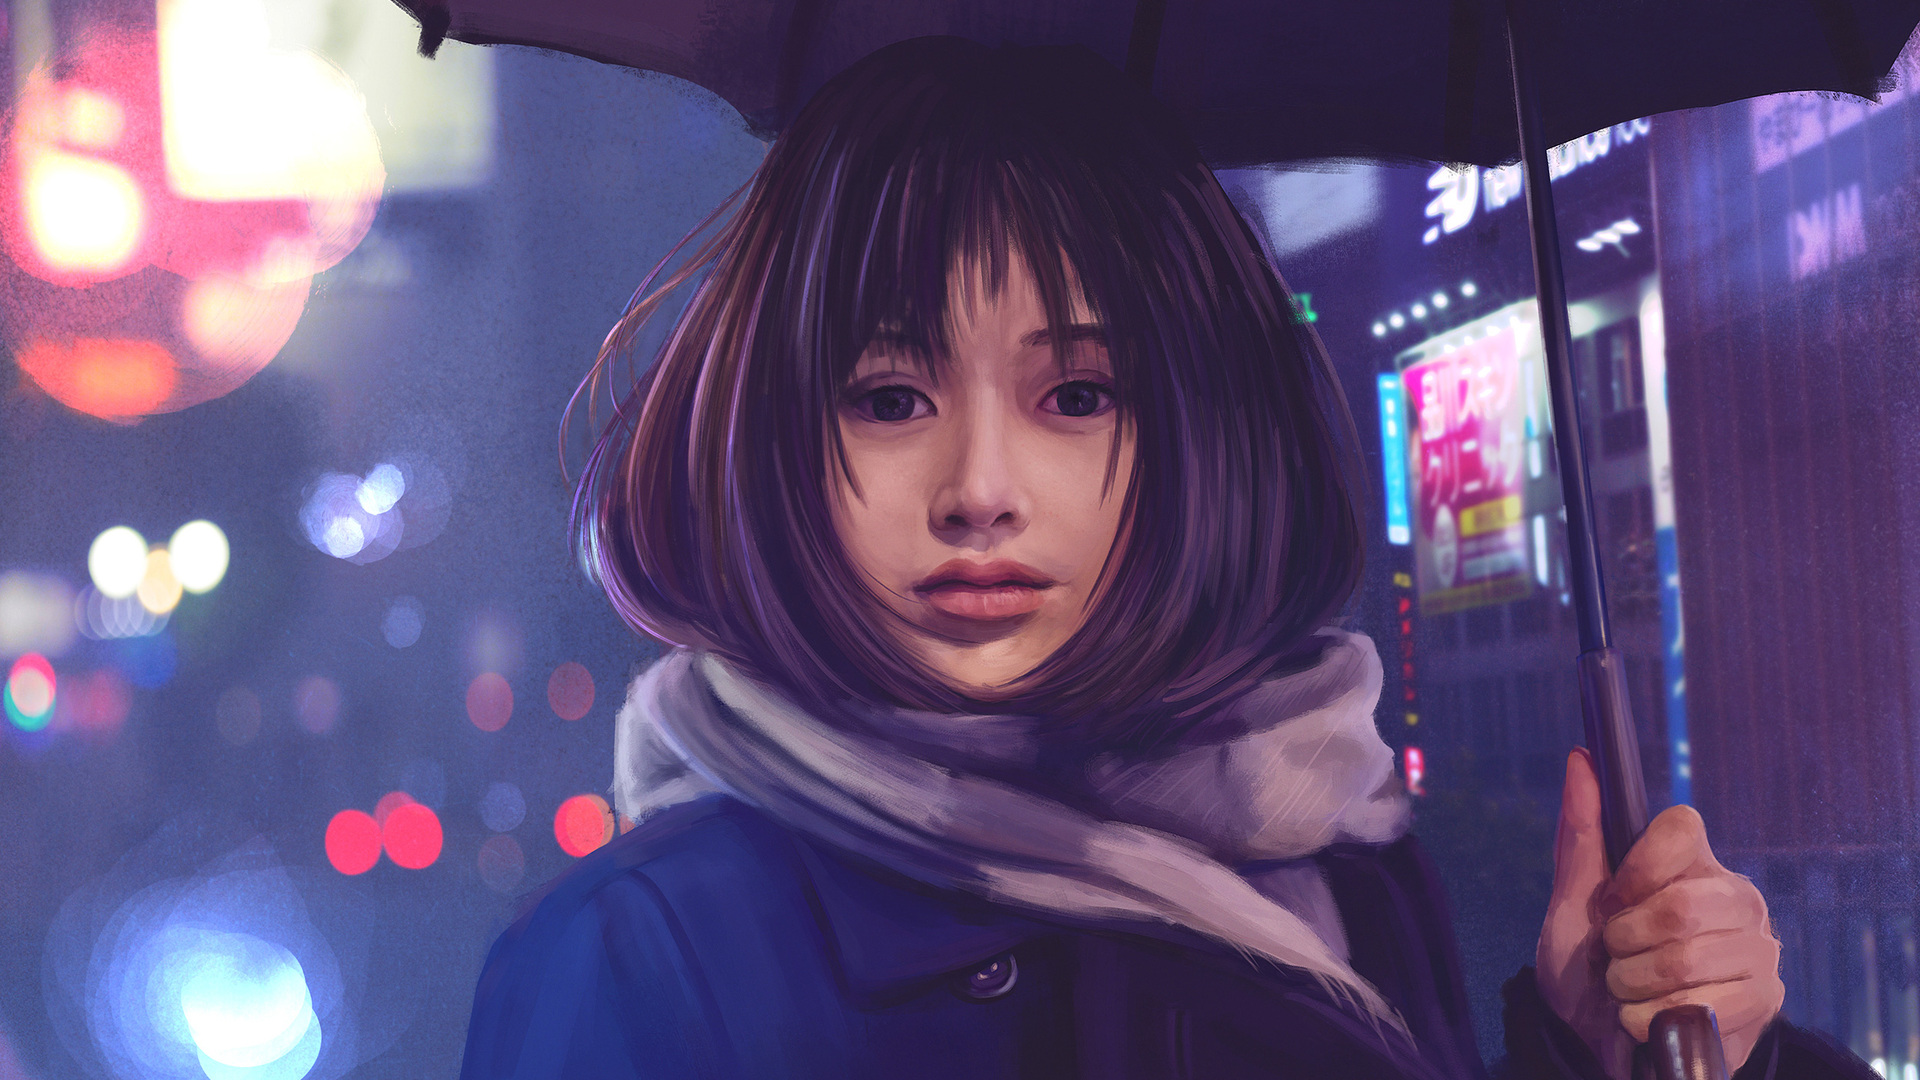 1920x1080 asian girl umbrella hd laptop full hd 1080p hd 4k asian girl umbrella hd vog voltagebd Images